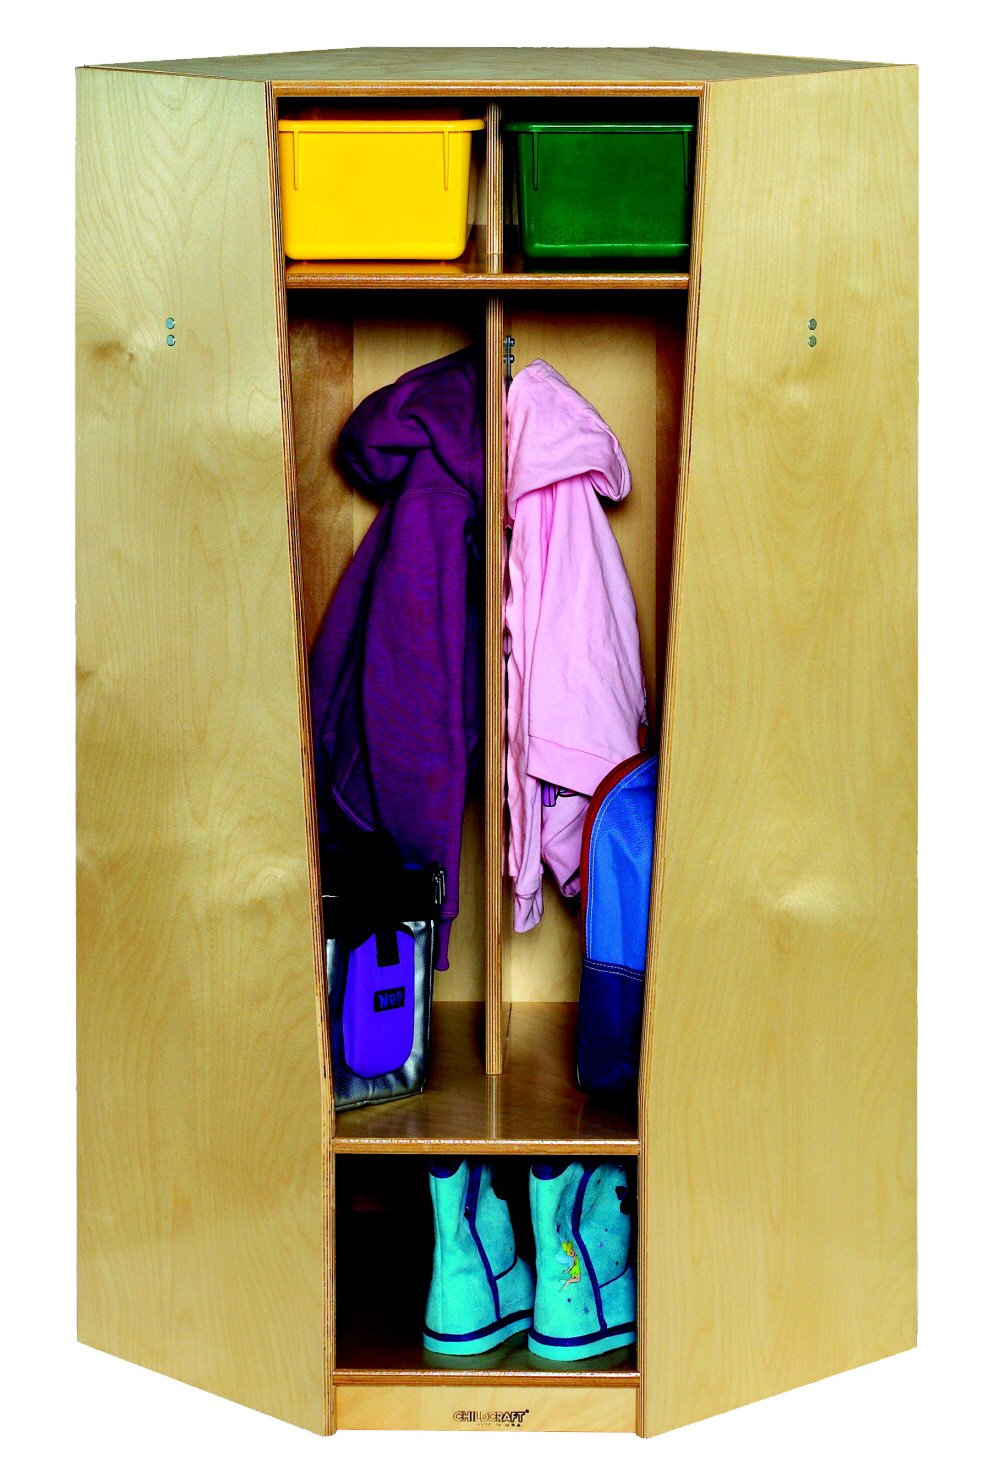 Childcraft 1357110 Corner Coat Locker, Wood, 21-1/2'' x 21-1/2'' x 48'', Natural Wood Tone